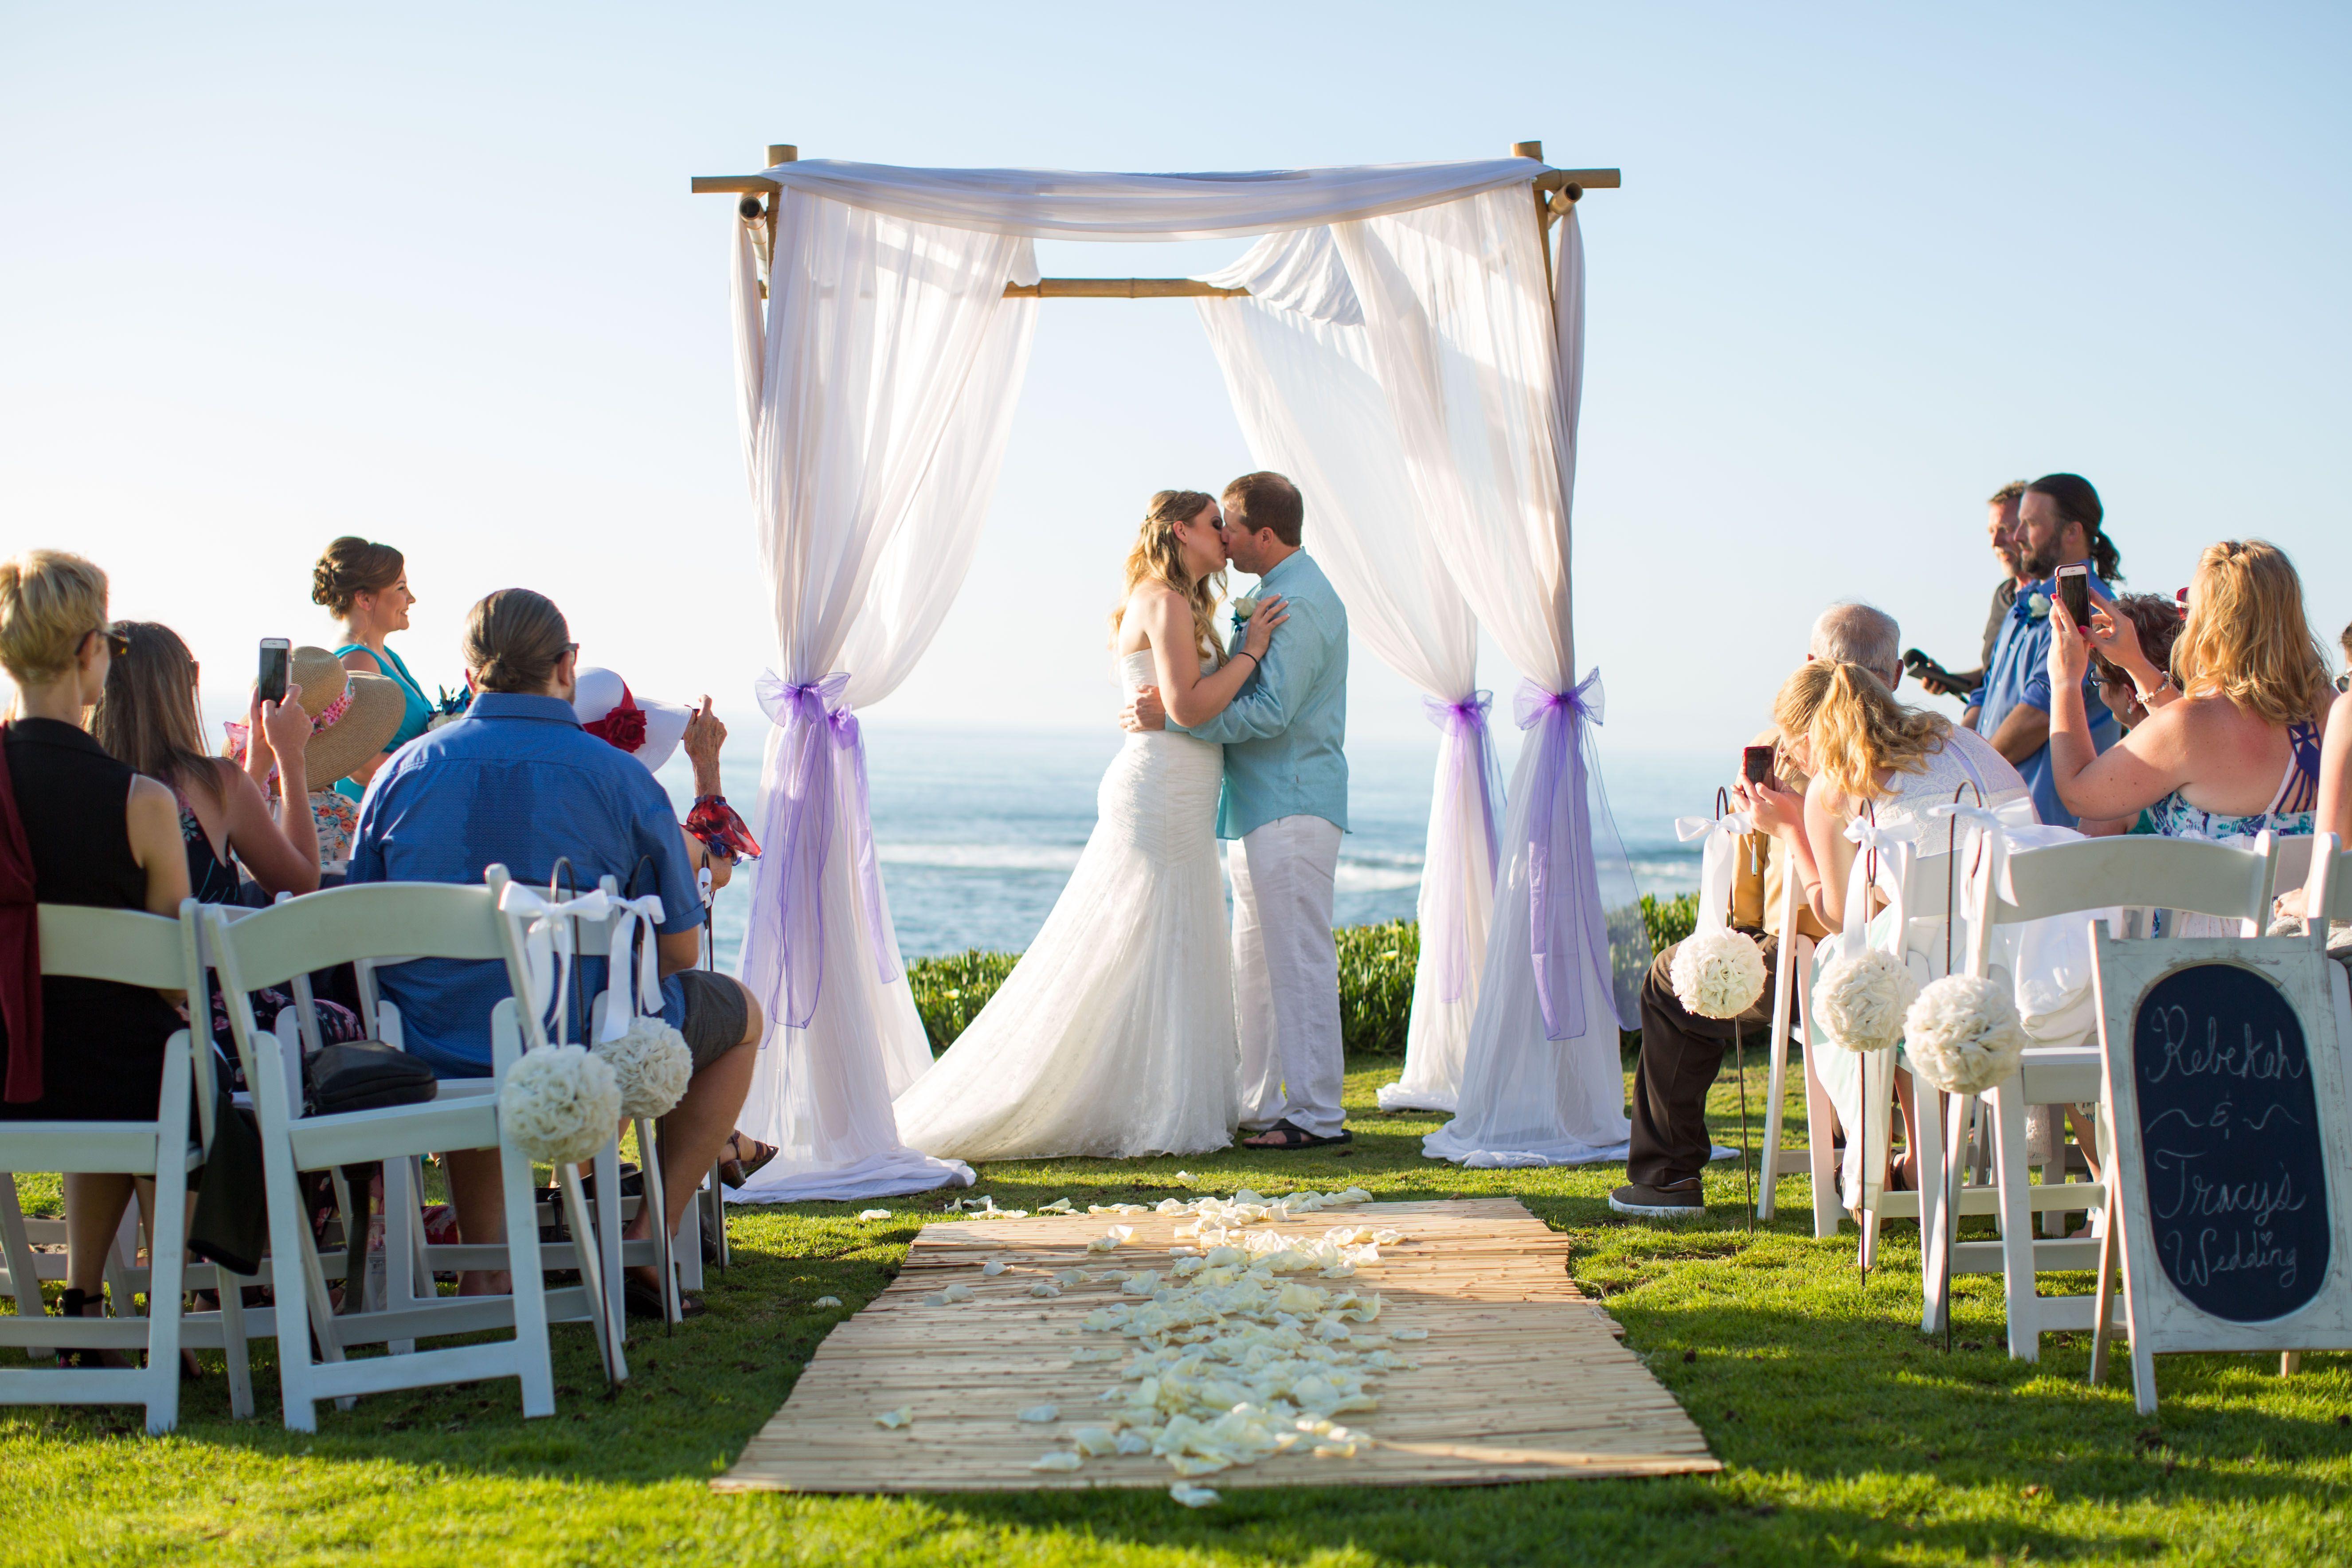 Pin By Dream Beach Wedding San Dieg On Canopies By Dream Beach Wedding San Diego San Diego Wedding Venues Dream Beach Wedding Beach Wedding